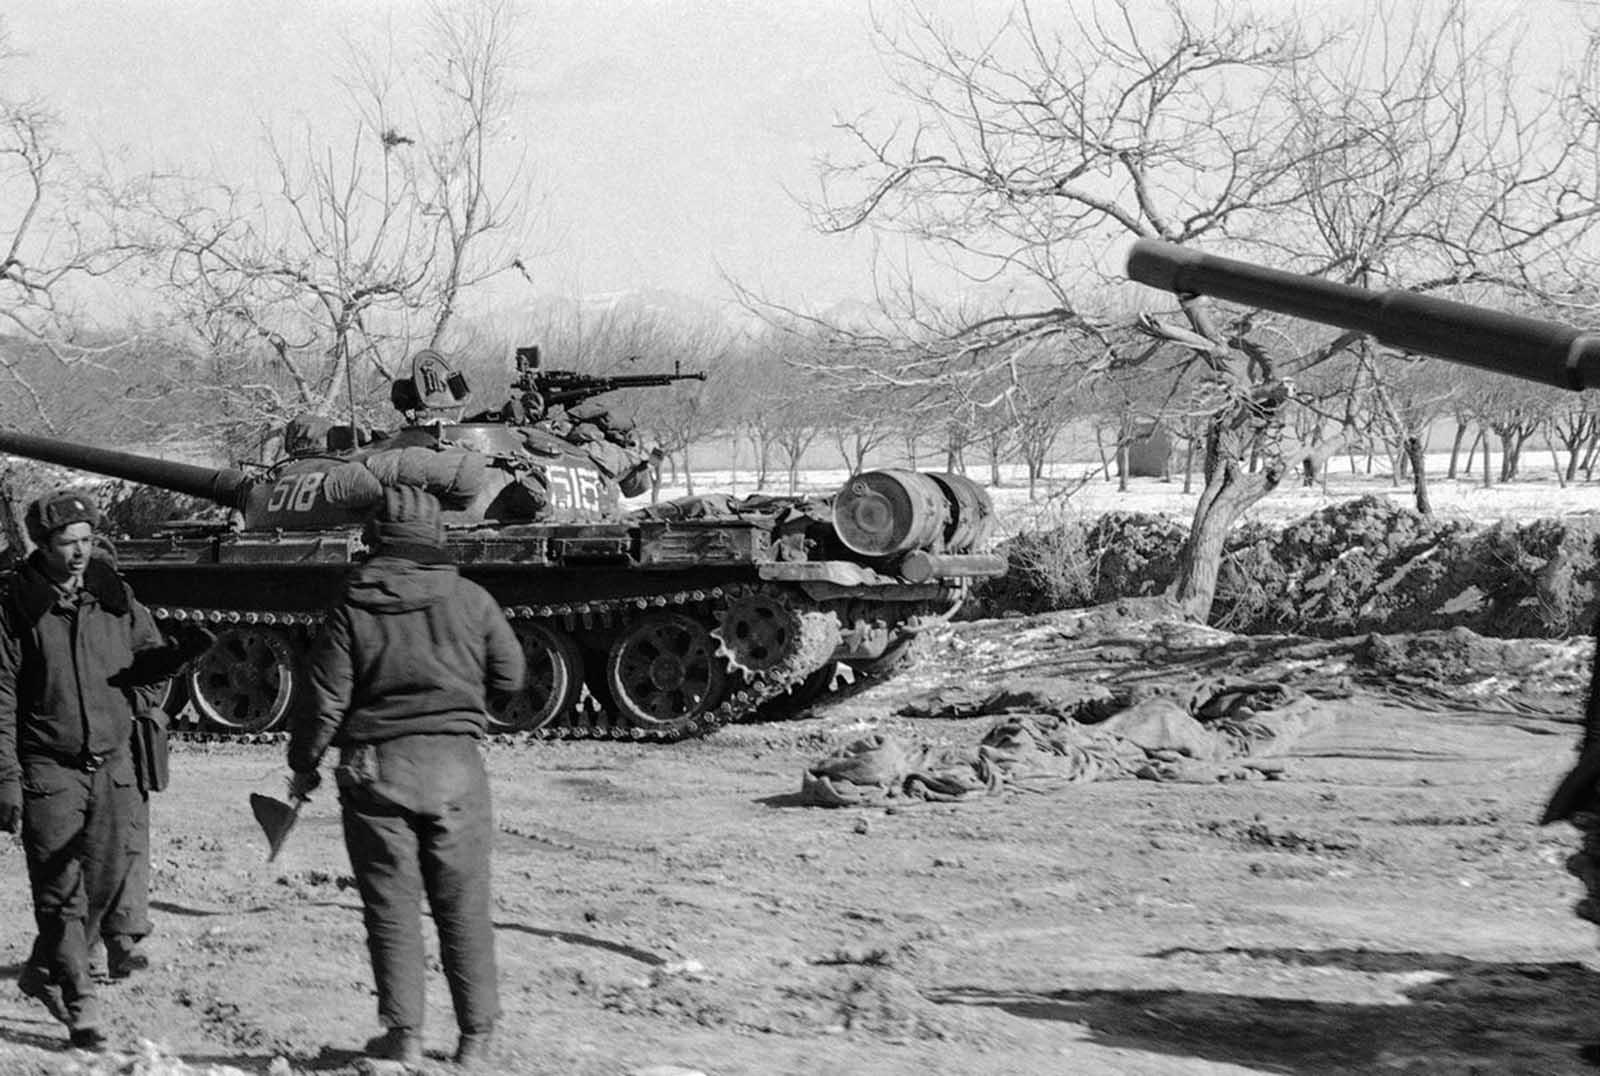 les blindés Soviet_war_in_afghanistan_in_pictures-3-jpg